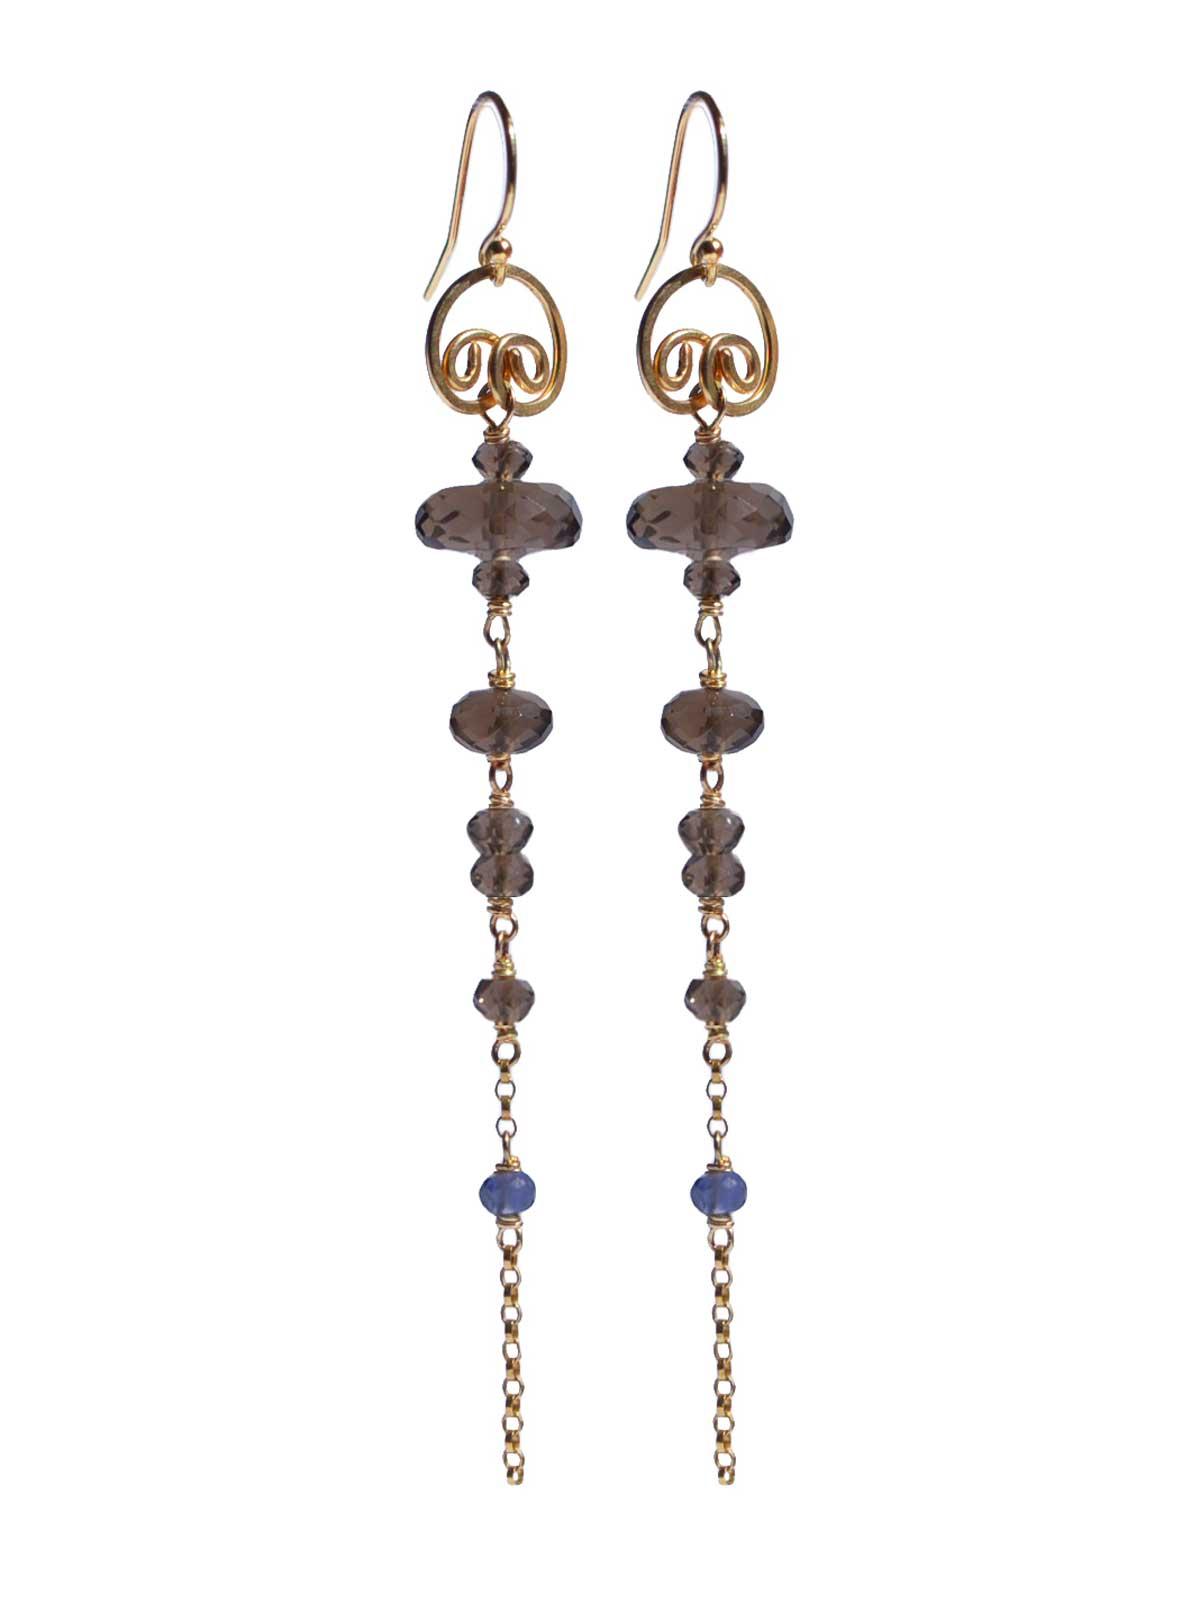 Earrings in 14K Gold-filled Smoky Quartz Iolite